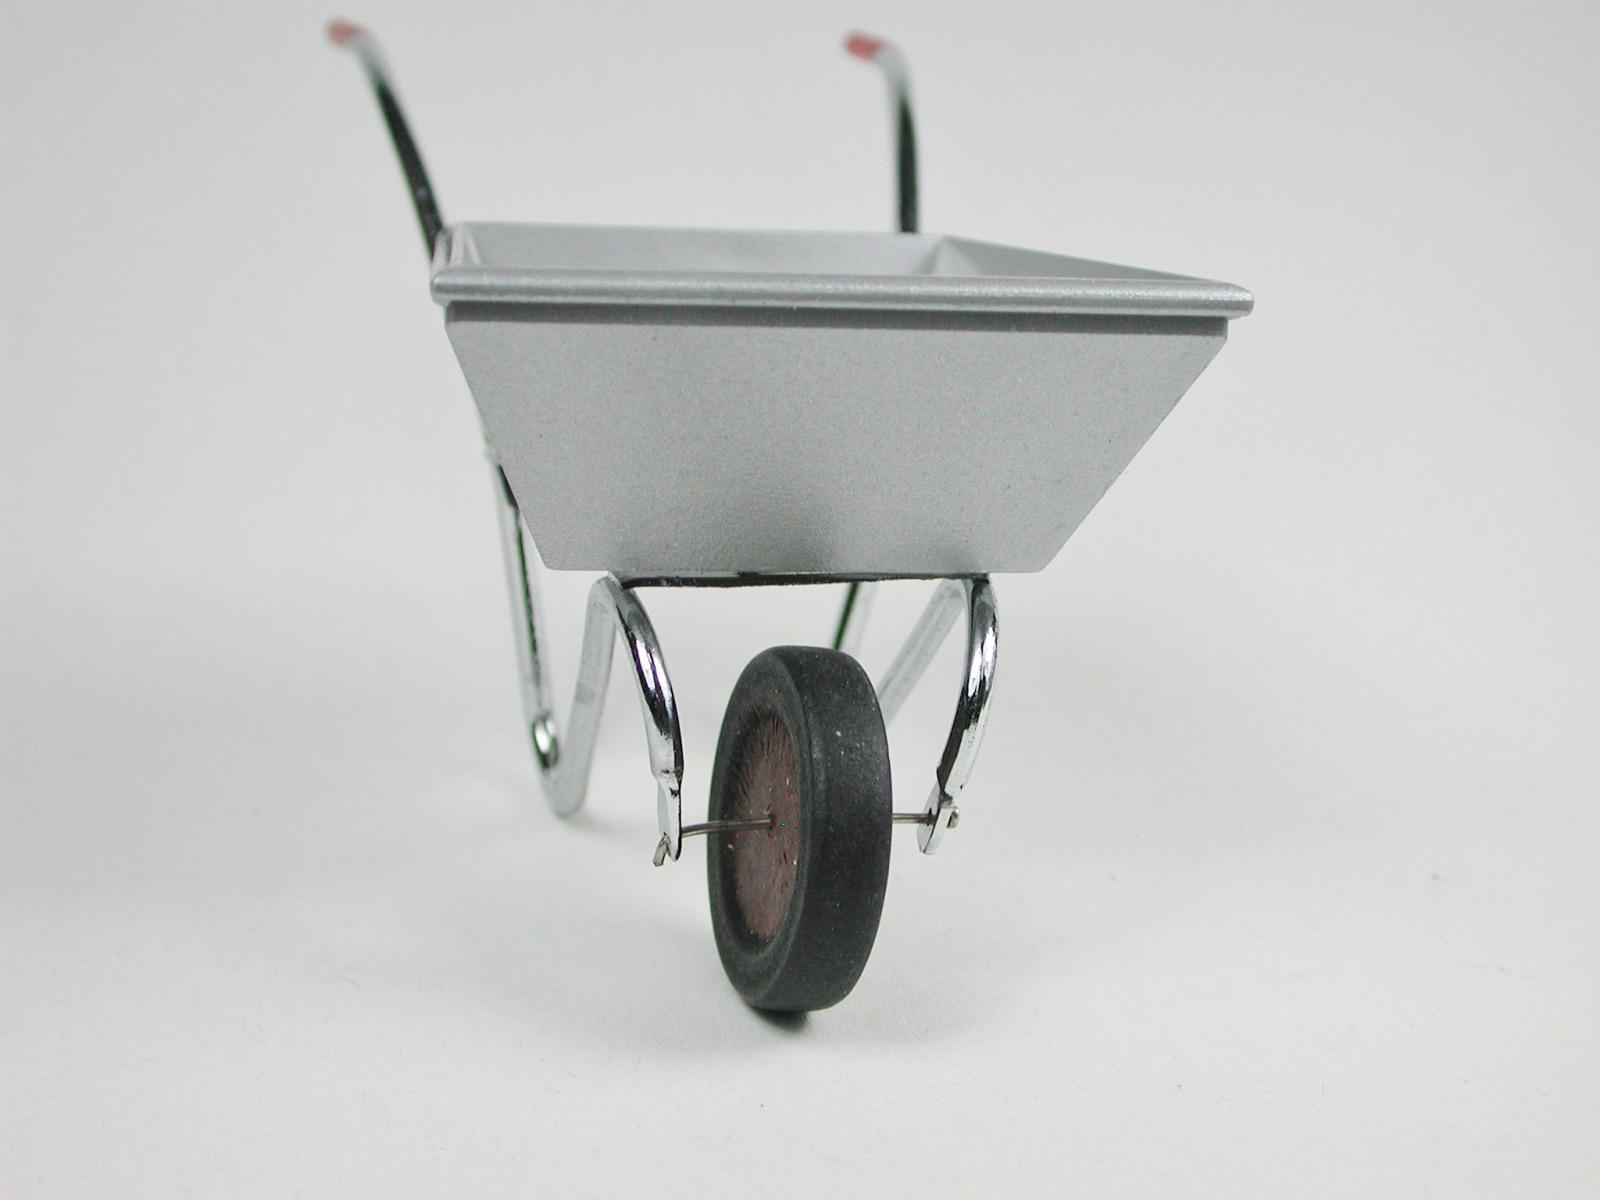 Schubkarre aus Metall 3